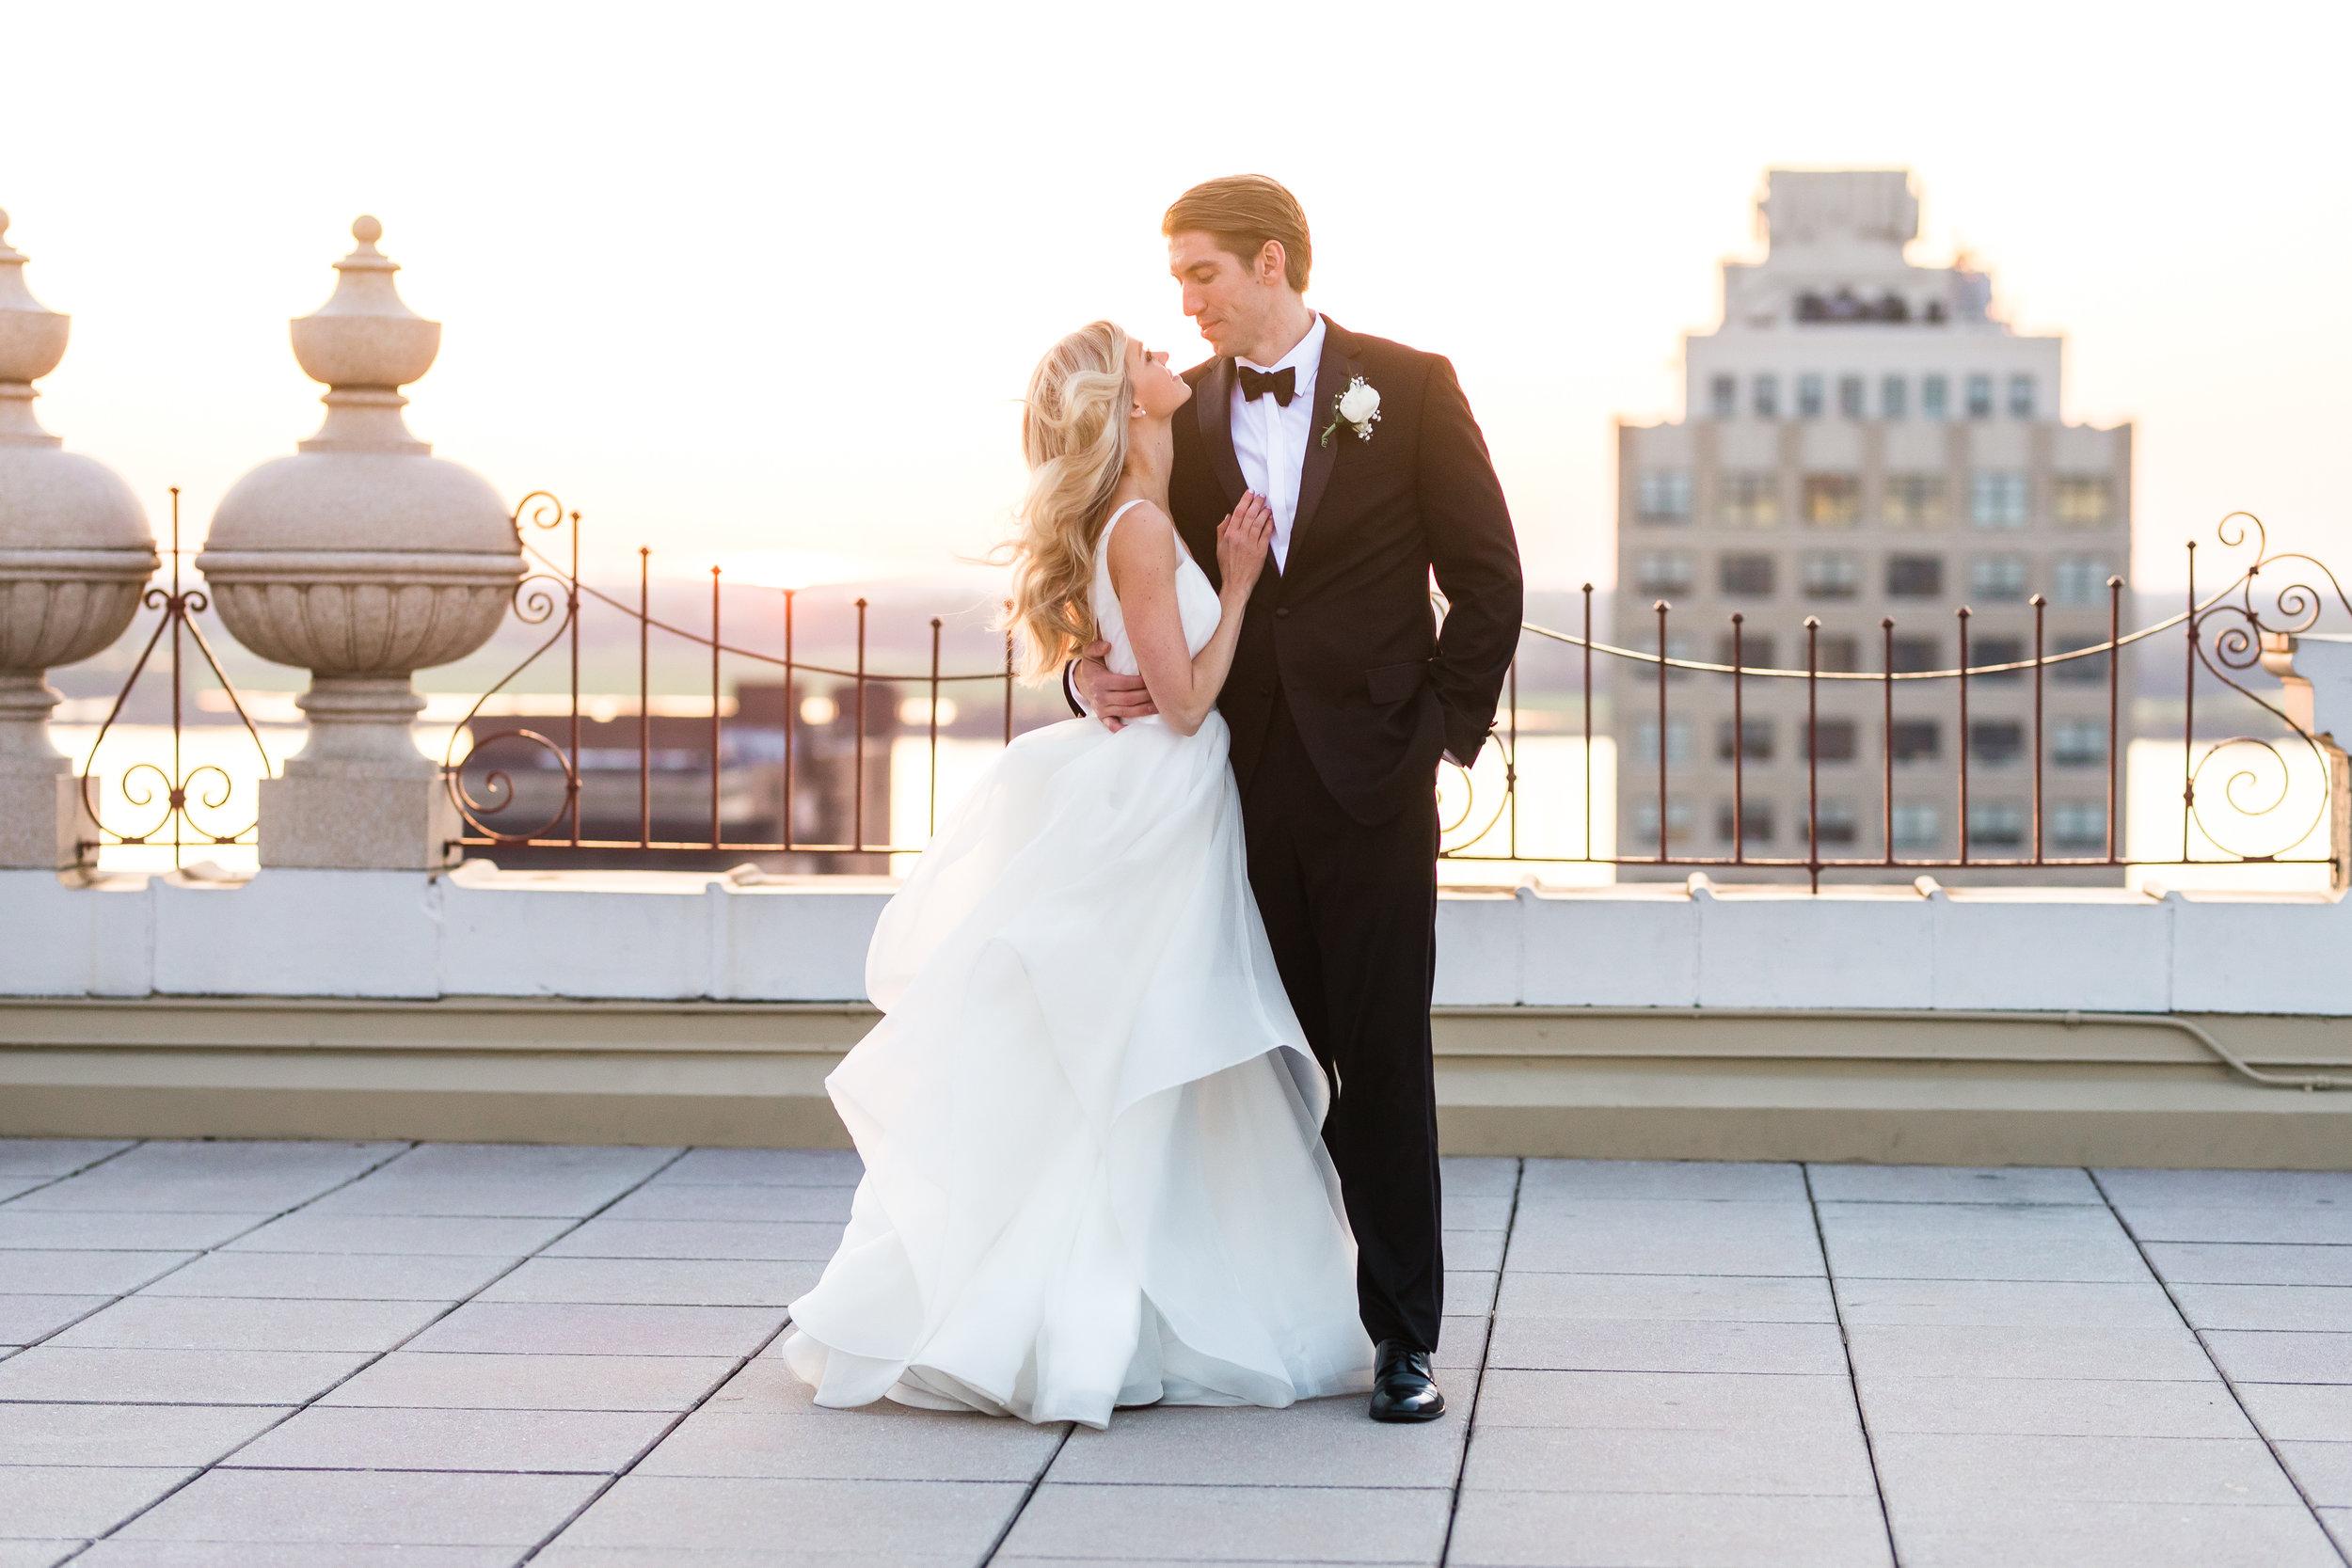 Rooftop Romance: Real Wedding